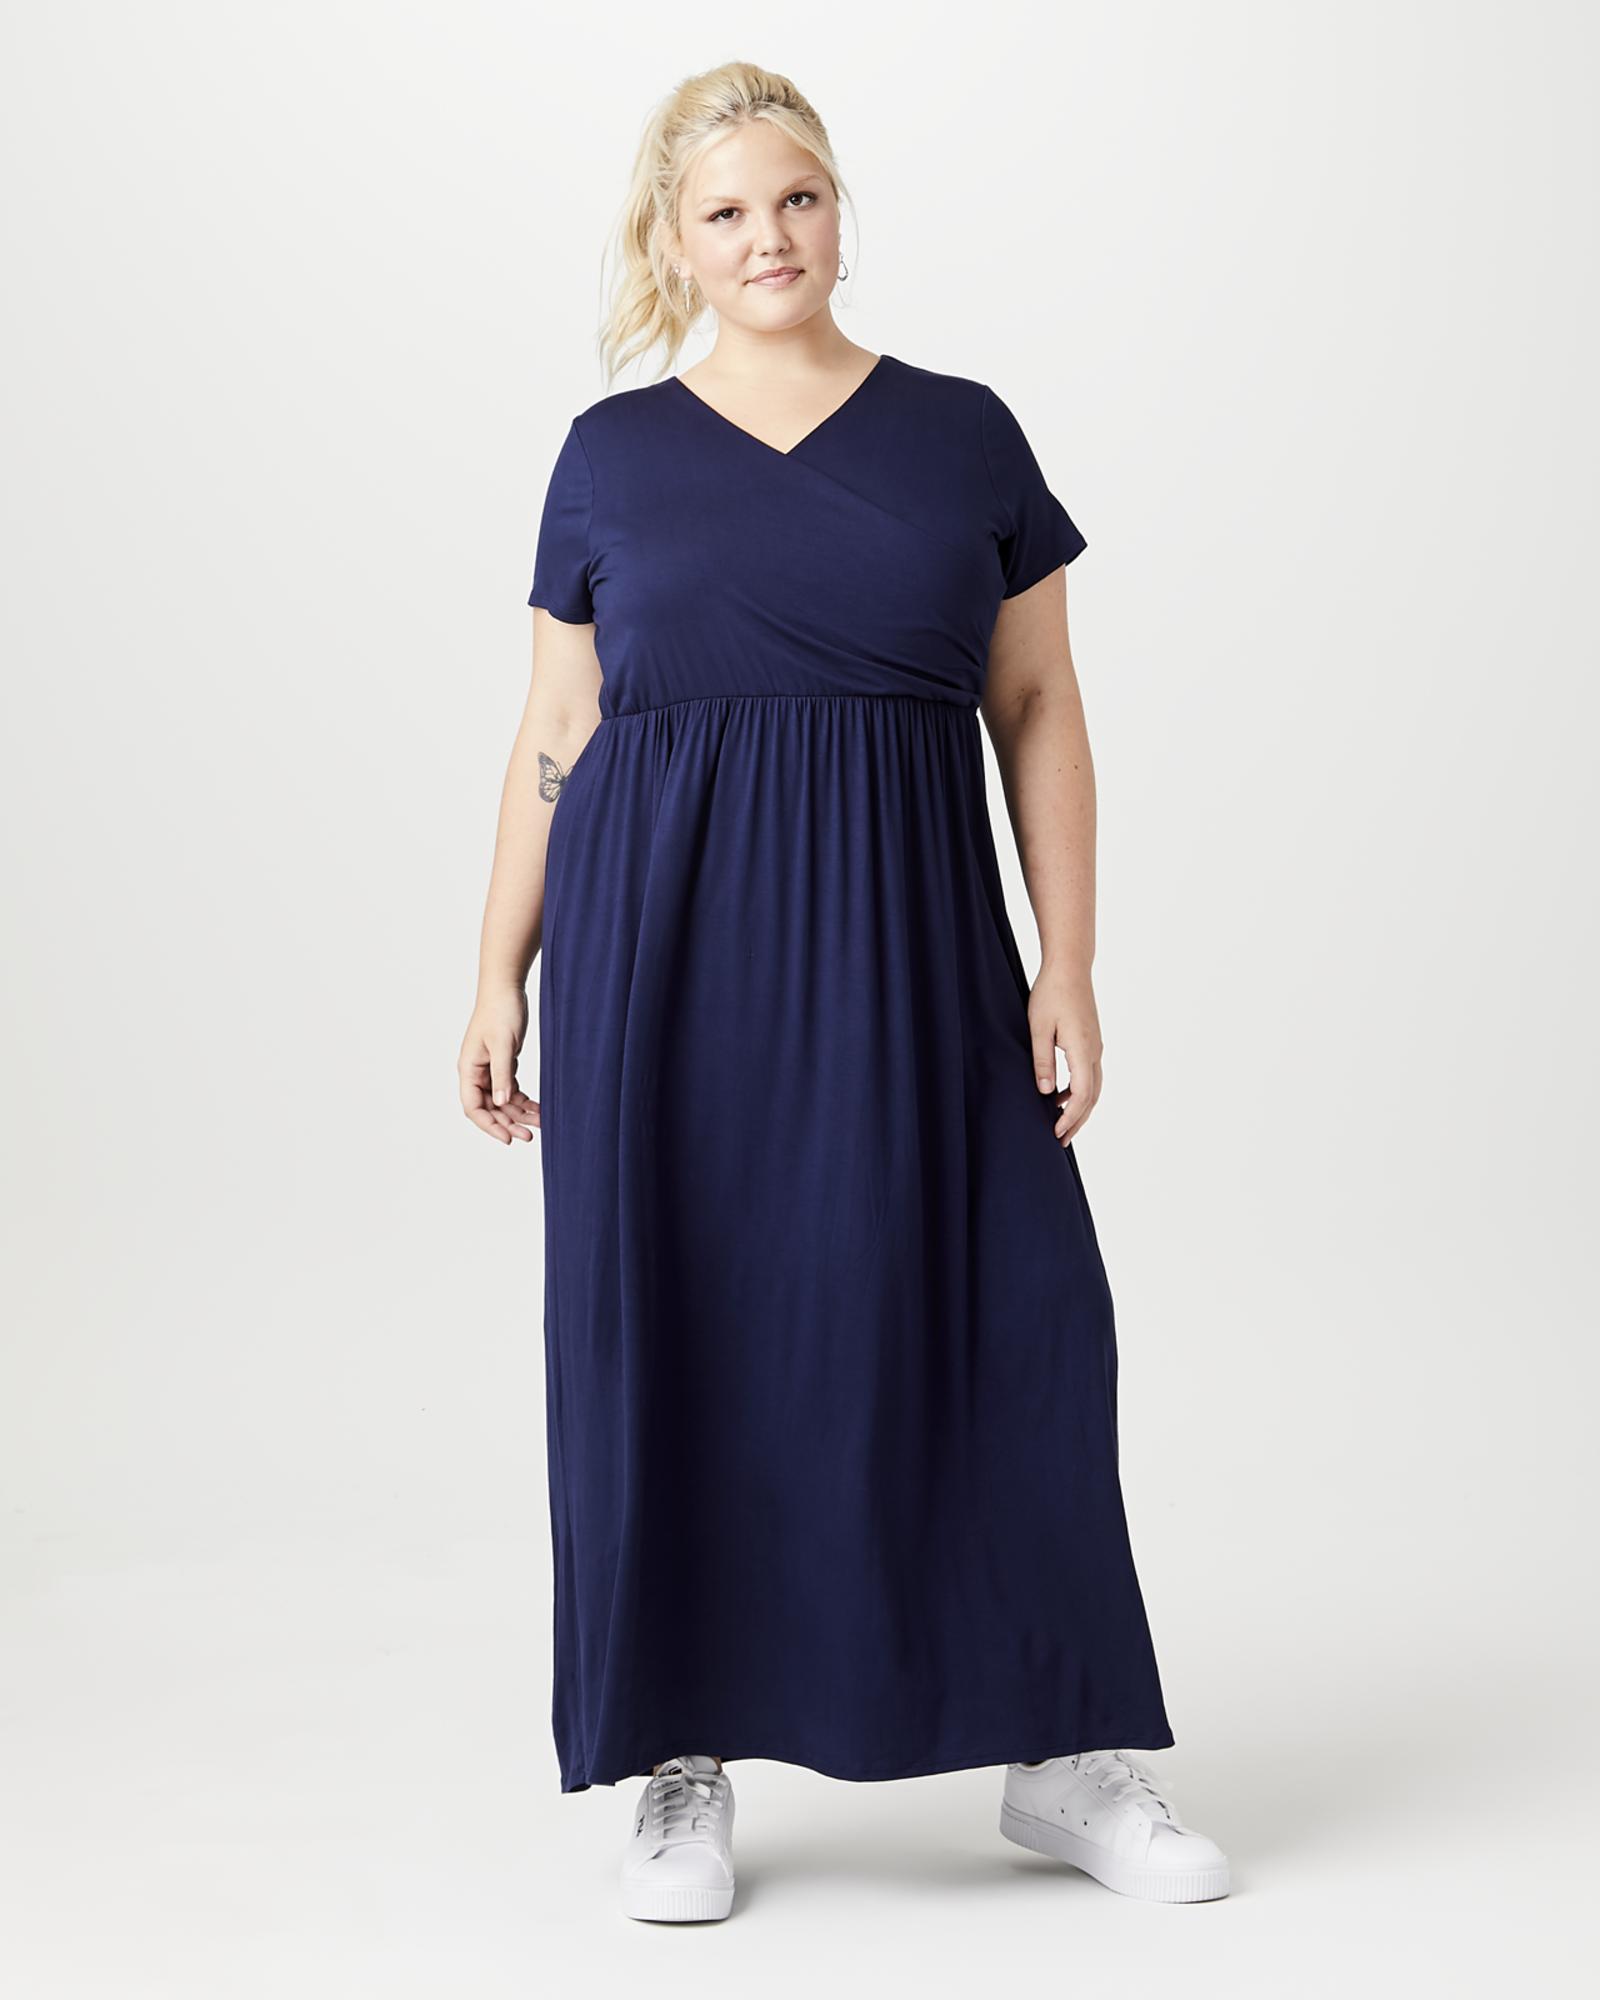 Women S Plus Size 2x 3x 4x Maxi Casual Sundress Party Hawaiian Long Summer Dress Long Summer Dresses Summer Dresses Maxi Dress Formal [ 906 x 1000 Pixel ]